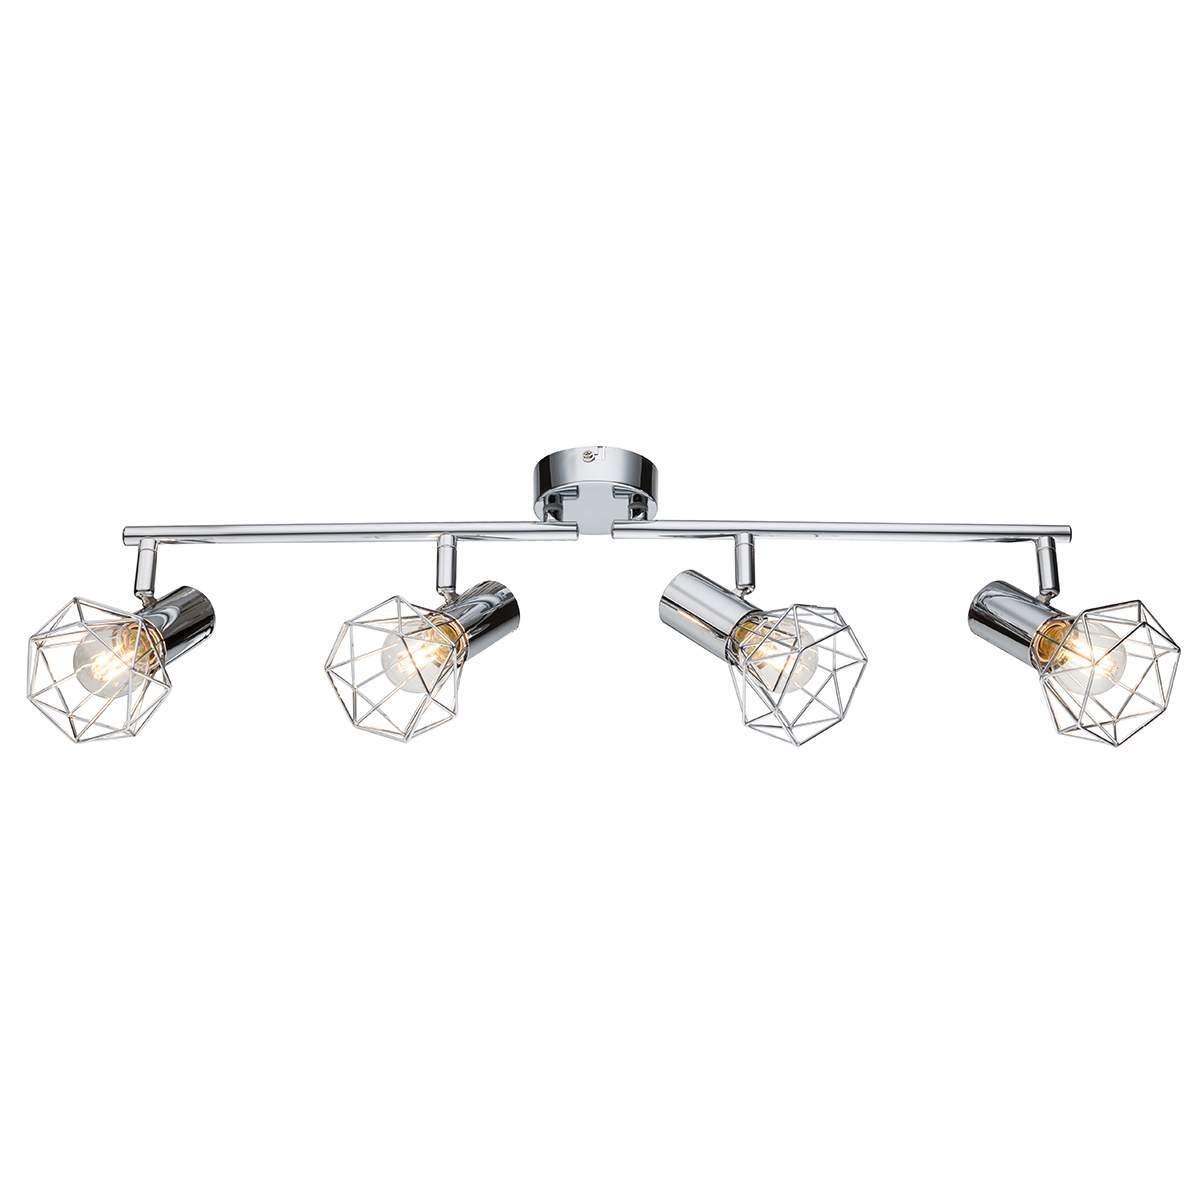 Spot regolabili – plafoniera Daiva 4 punti luce Illuminazione per interni